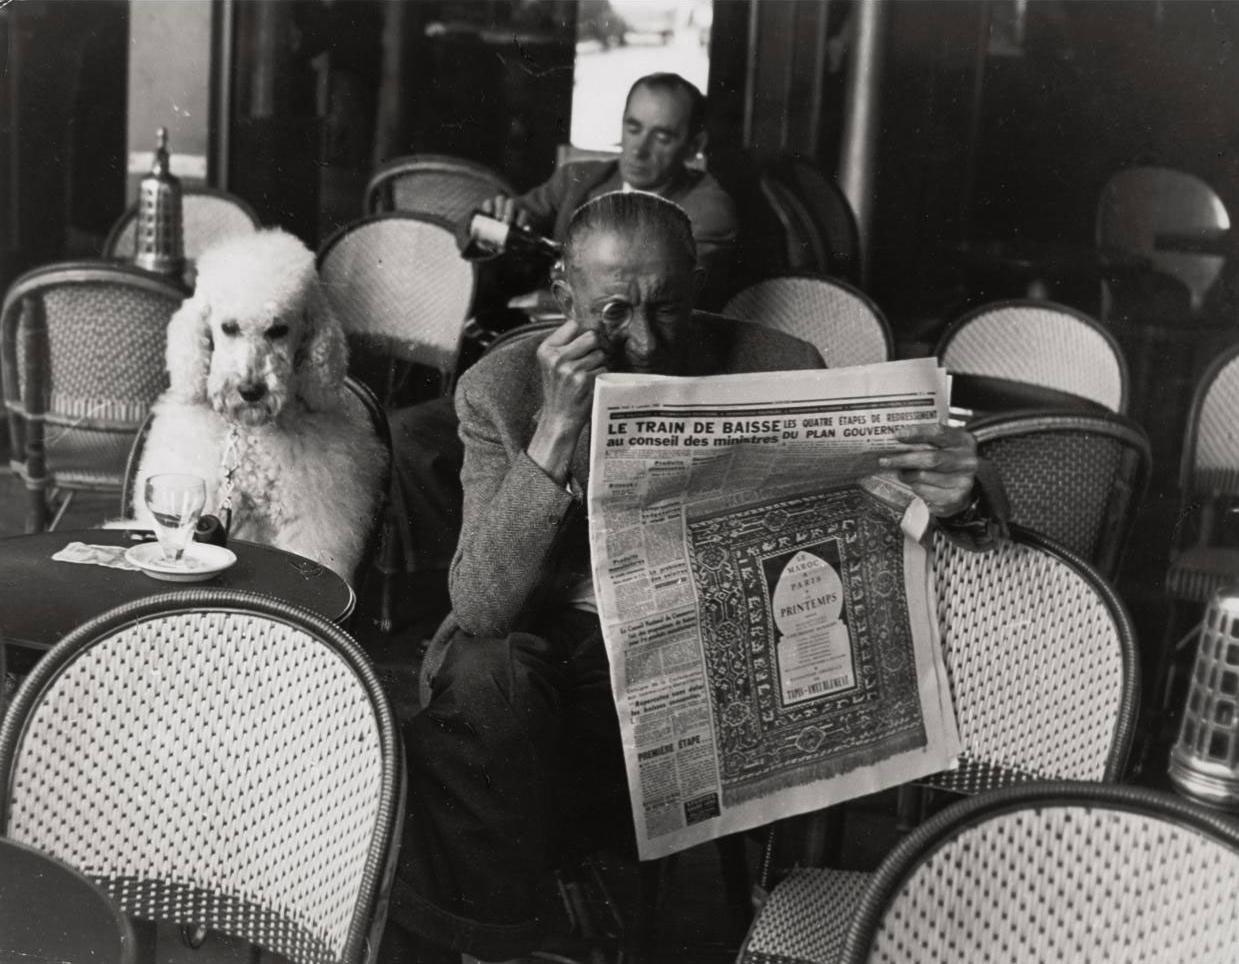 Edouard Boubat 1923 1999 Cafe De Flore 1953 1950s - Fotos-de-flore